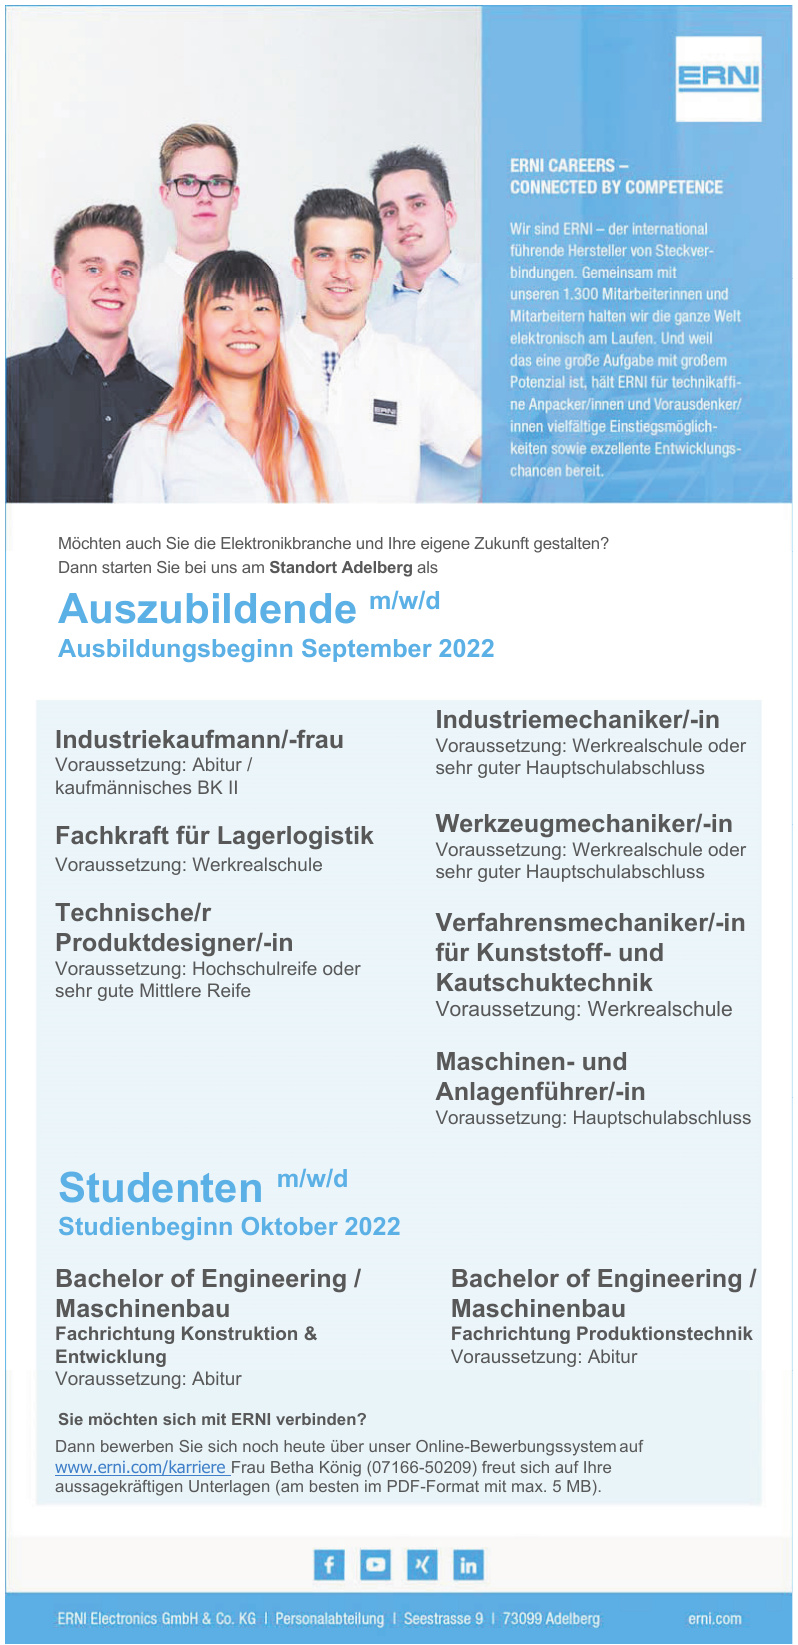 ERNI Elektronics GmbH & Co. KG